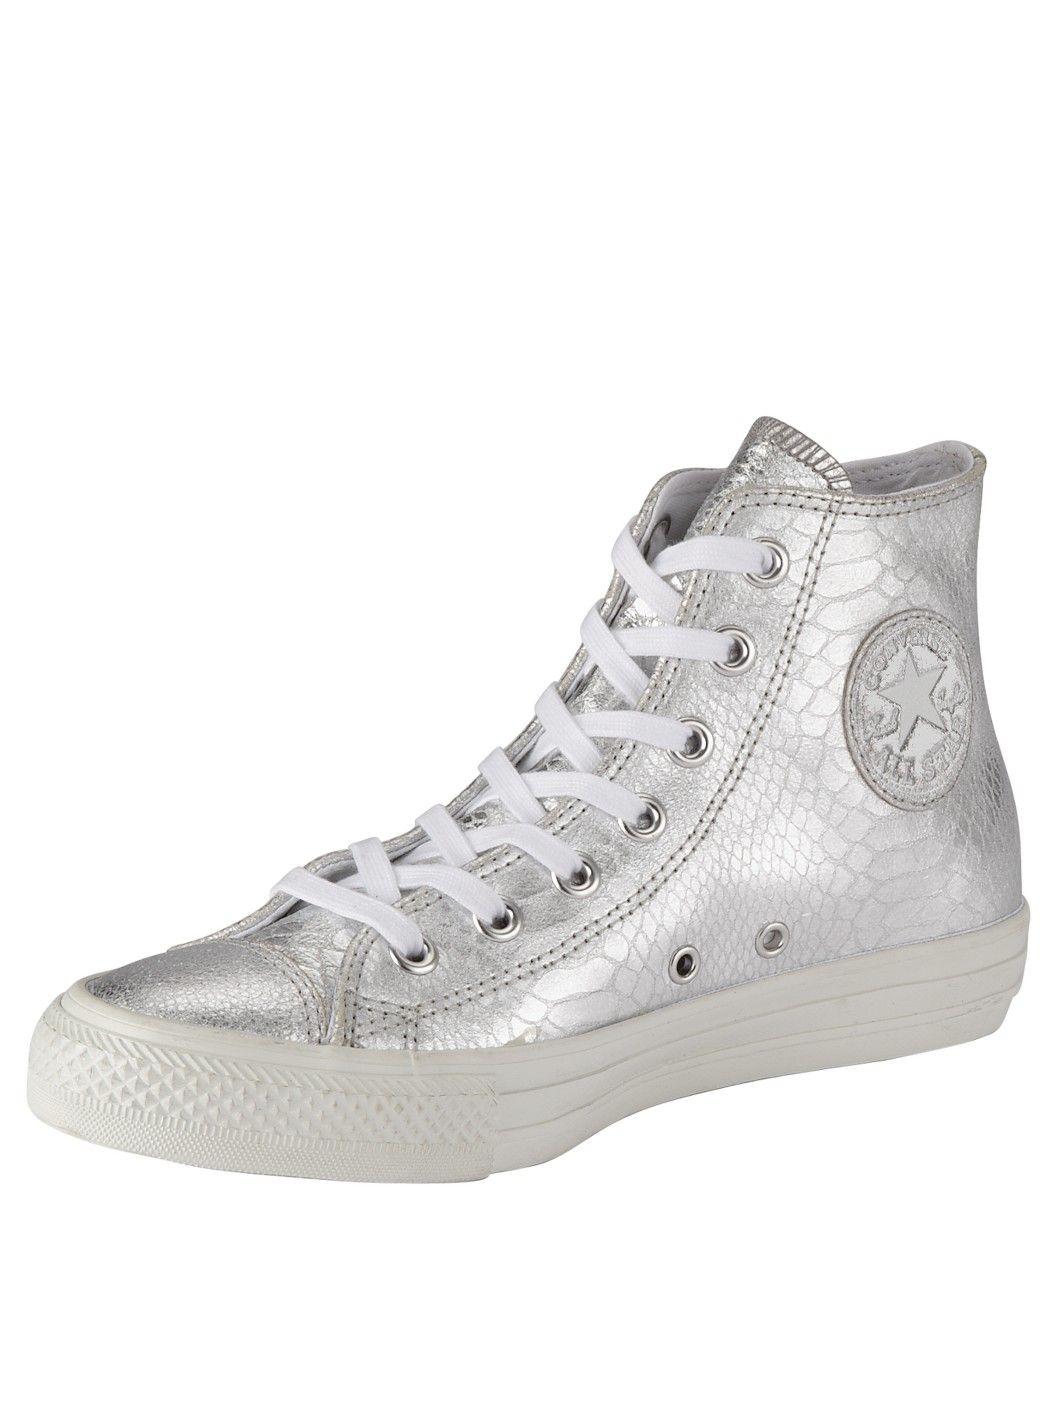 cd722702c72 Converse Chuck Taylor All Star Elevated Glam Silver Hi Top Plimsolls ...